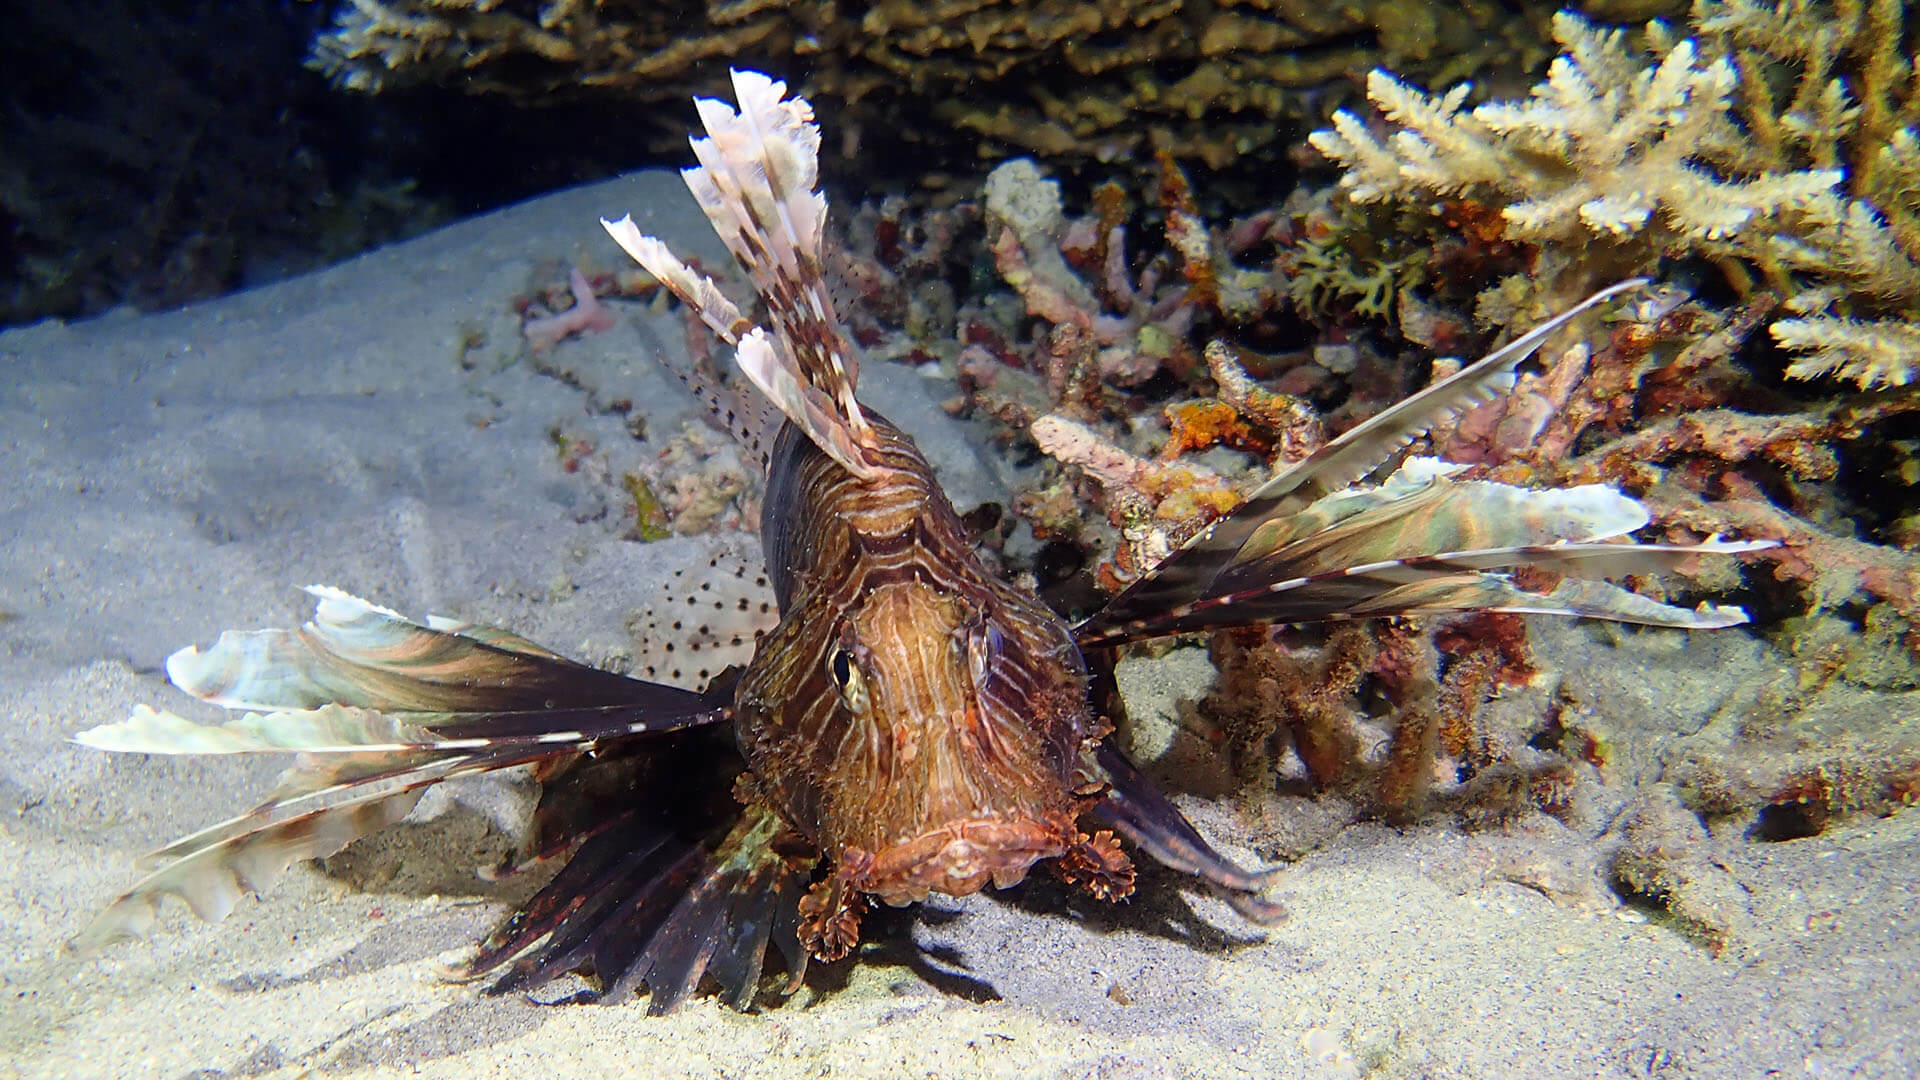 Lionfish – A Smart Fish?